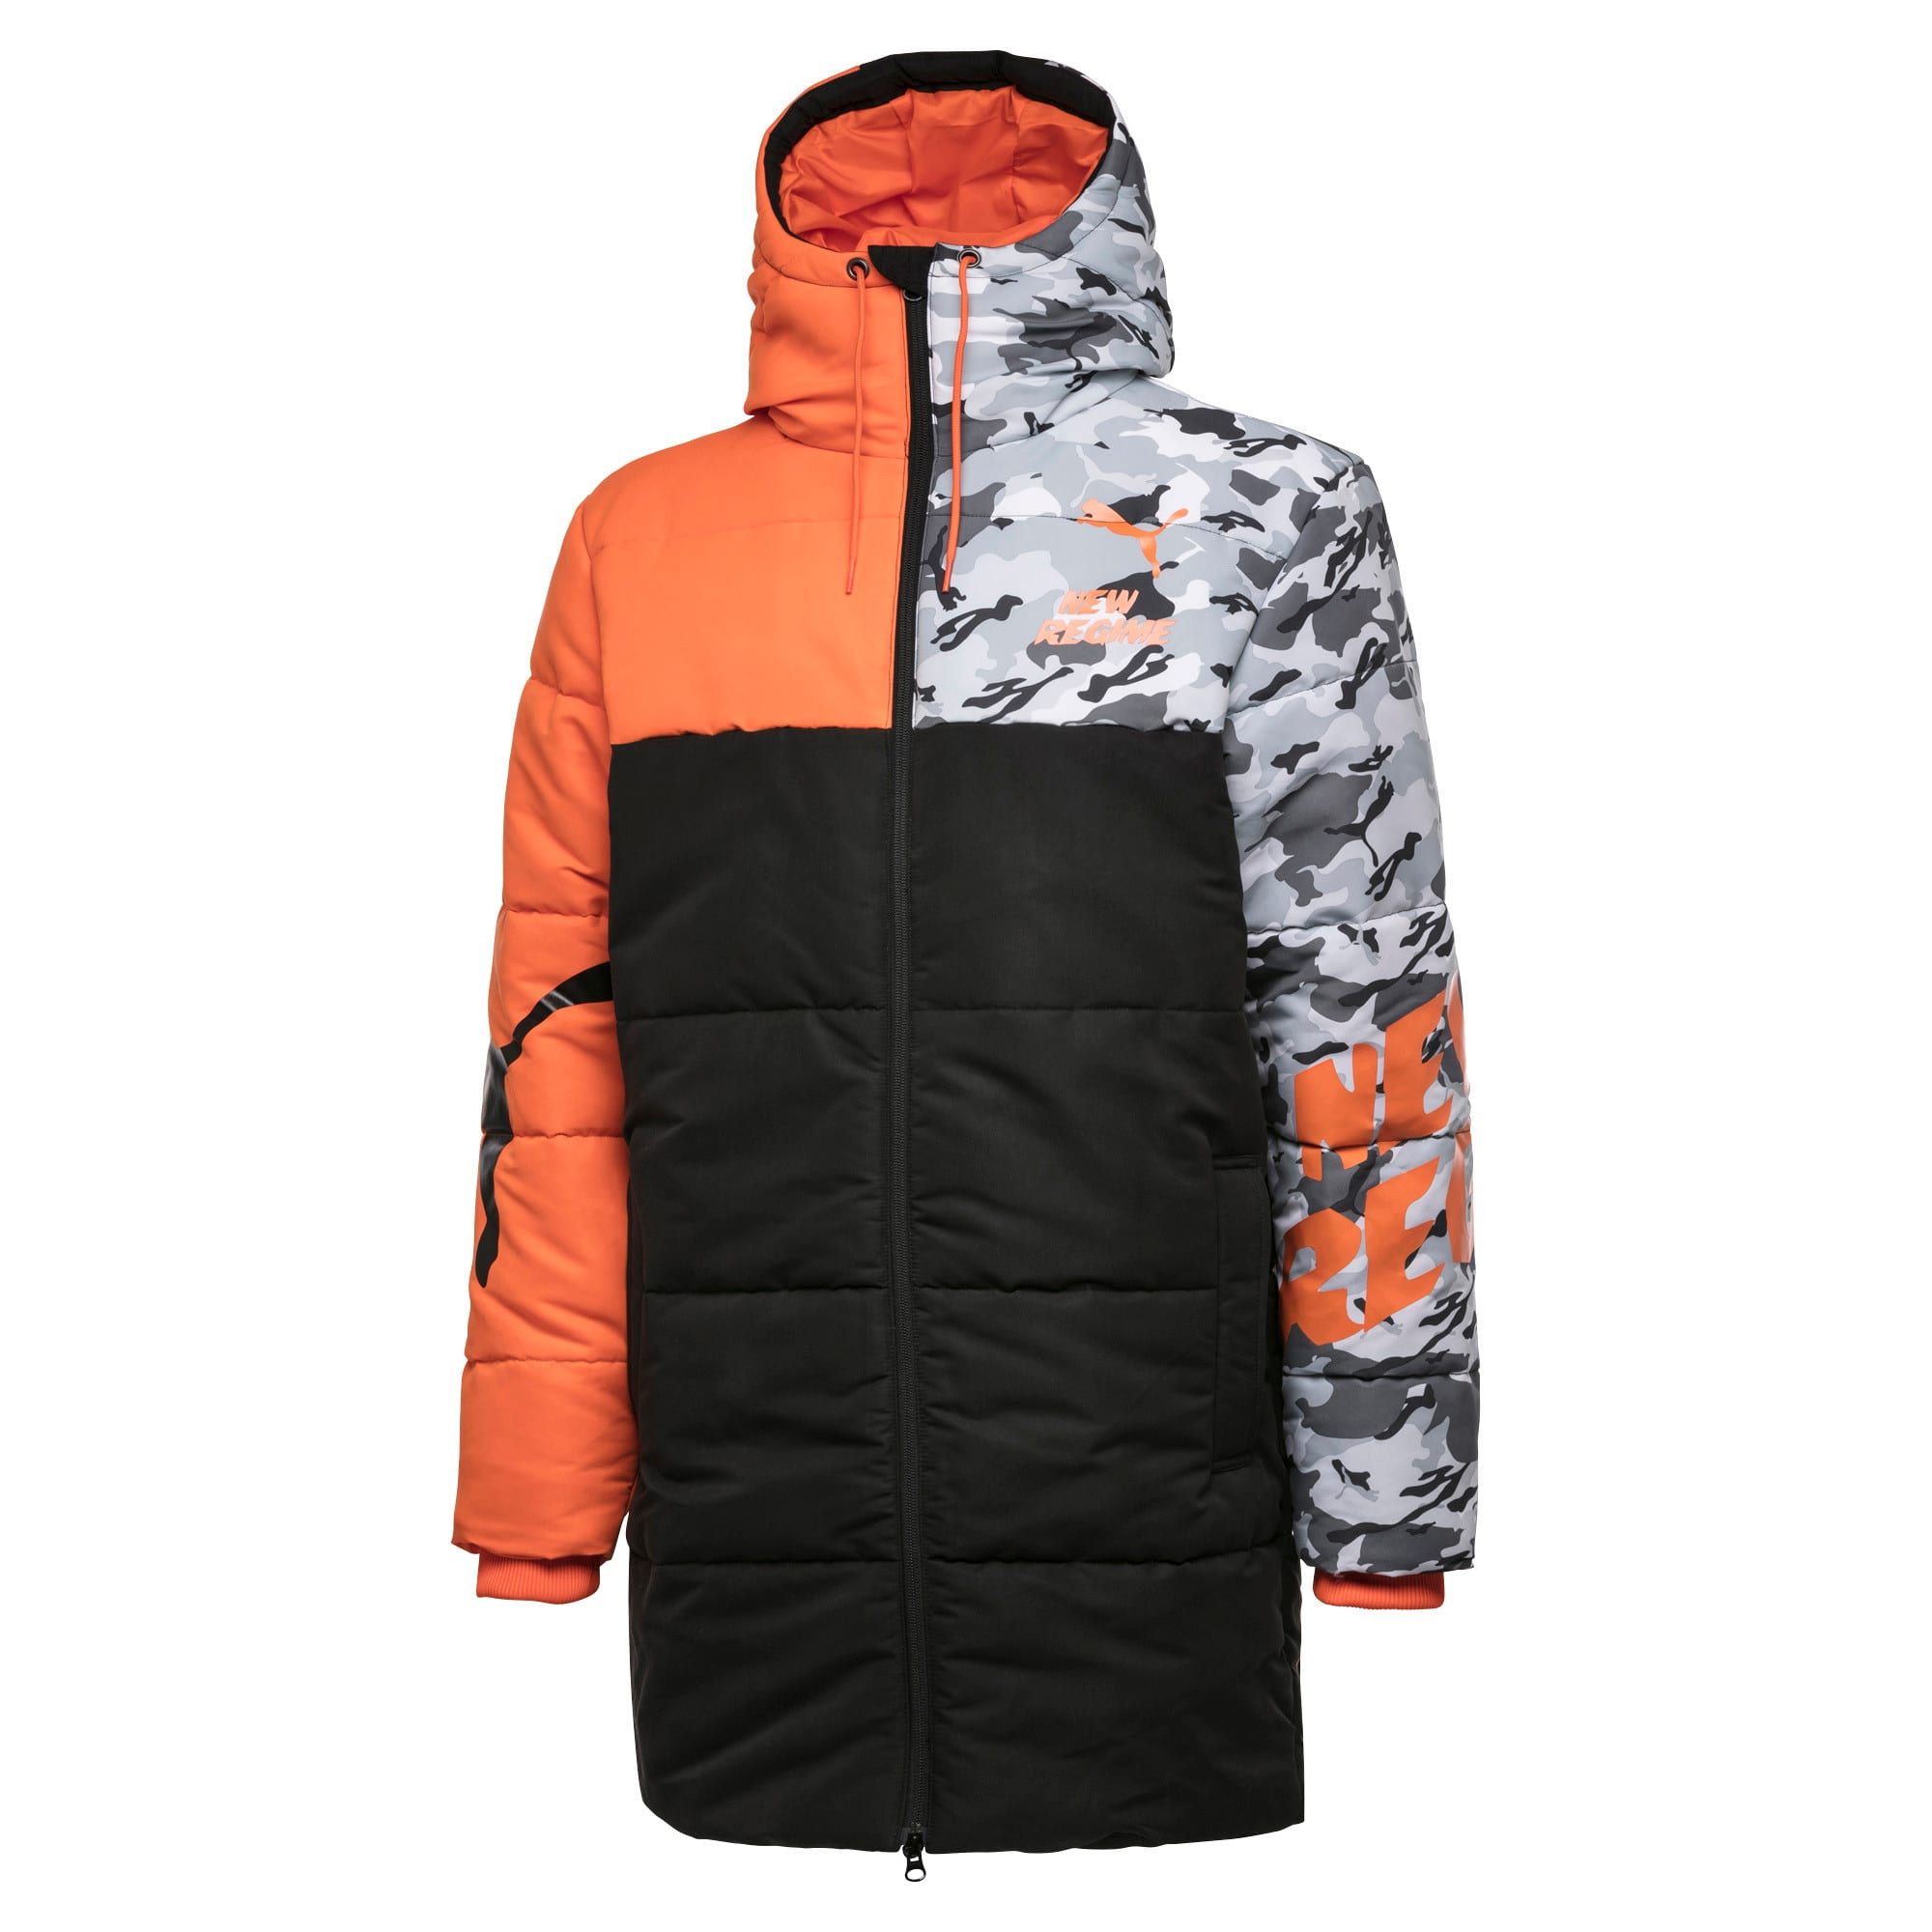 Thumbnail 1 of PUMA x ATELIER NEW REGIME Long Zip-Up Men's Hooded Jacket, Puma Black, medium